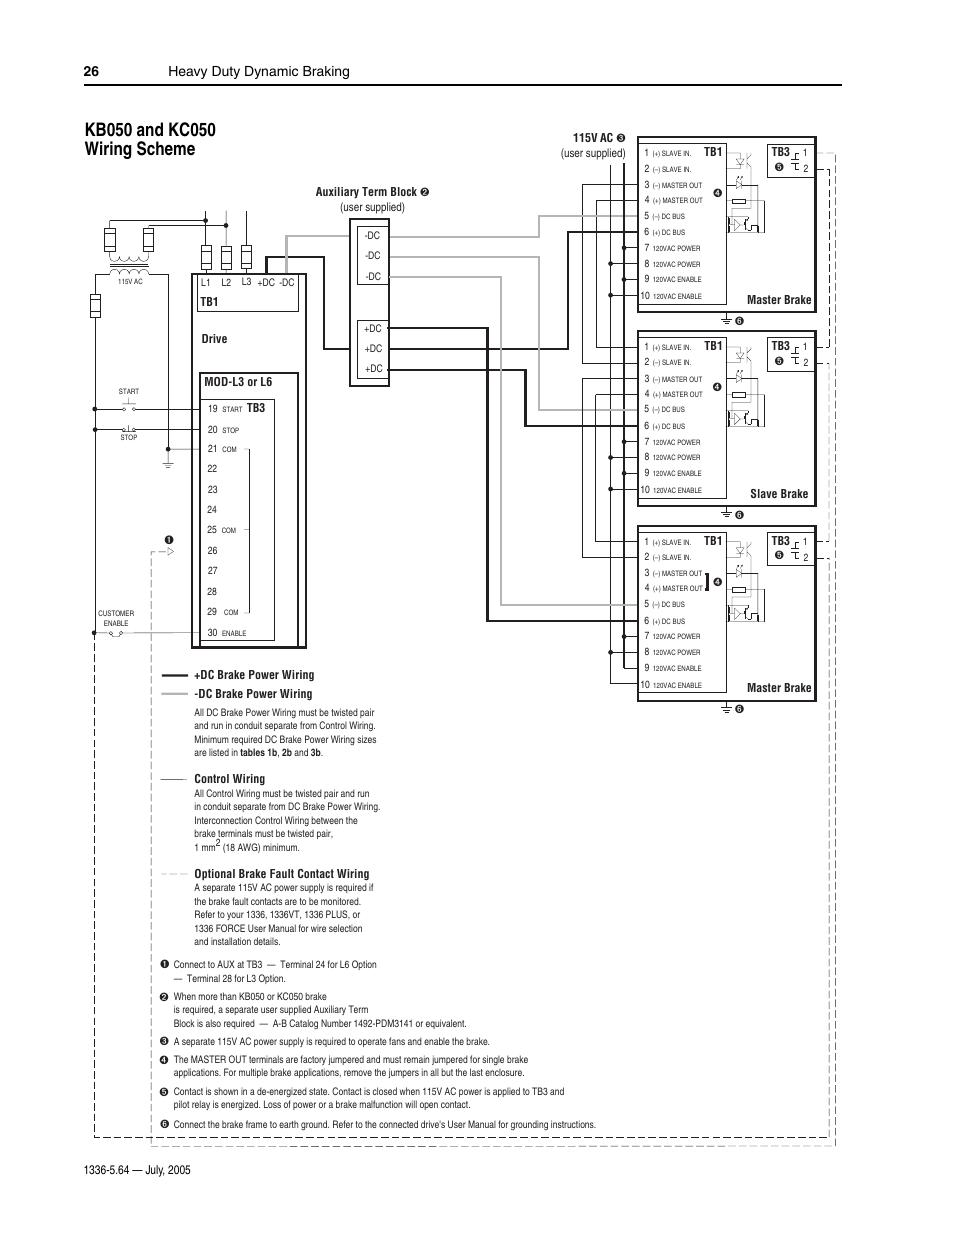 medium resolution of kb050 and kc050 wiring scheme heavy duty dynamic braking 26 rockwell automation 1336 s f t allen bradley dynamic braking user manual page 26 28